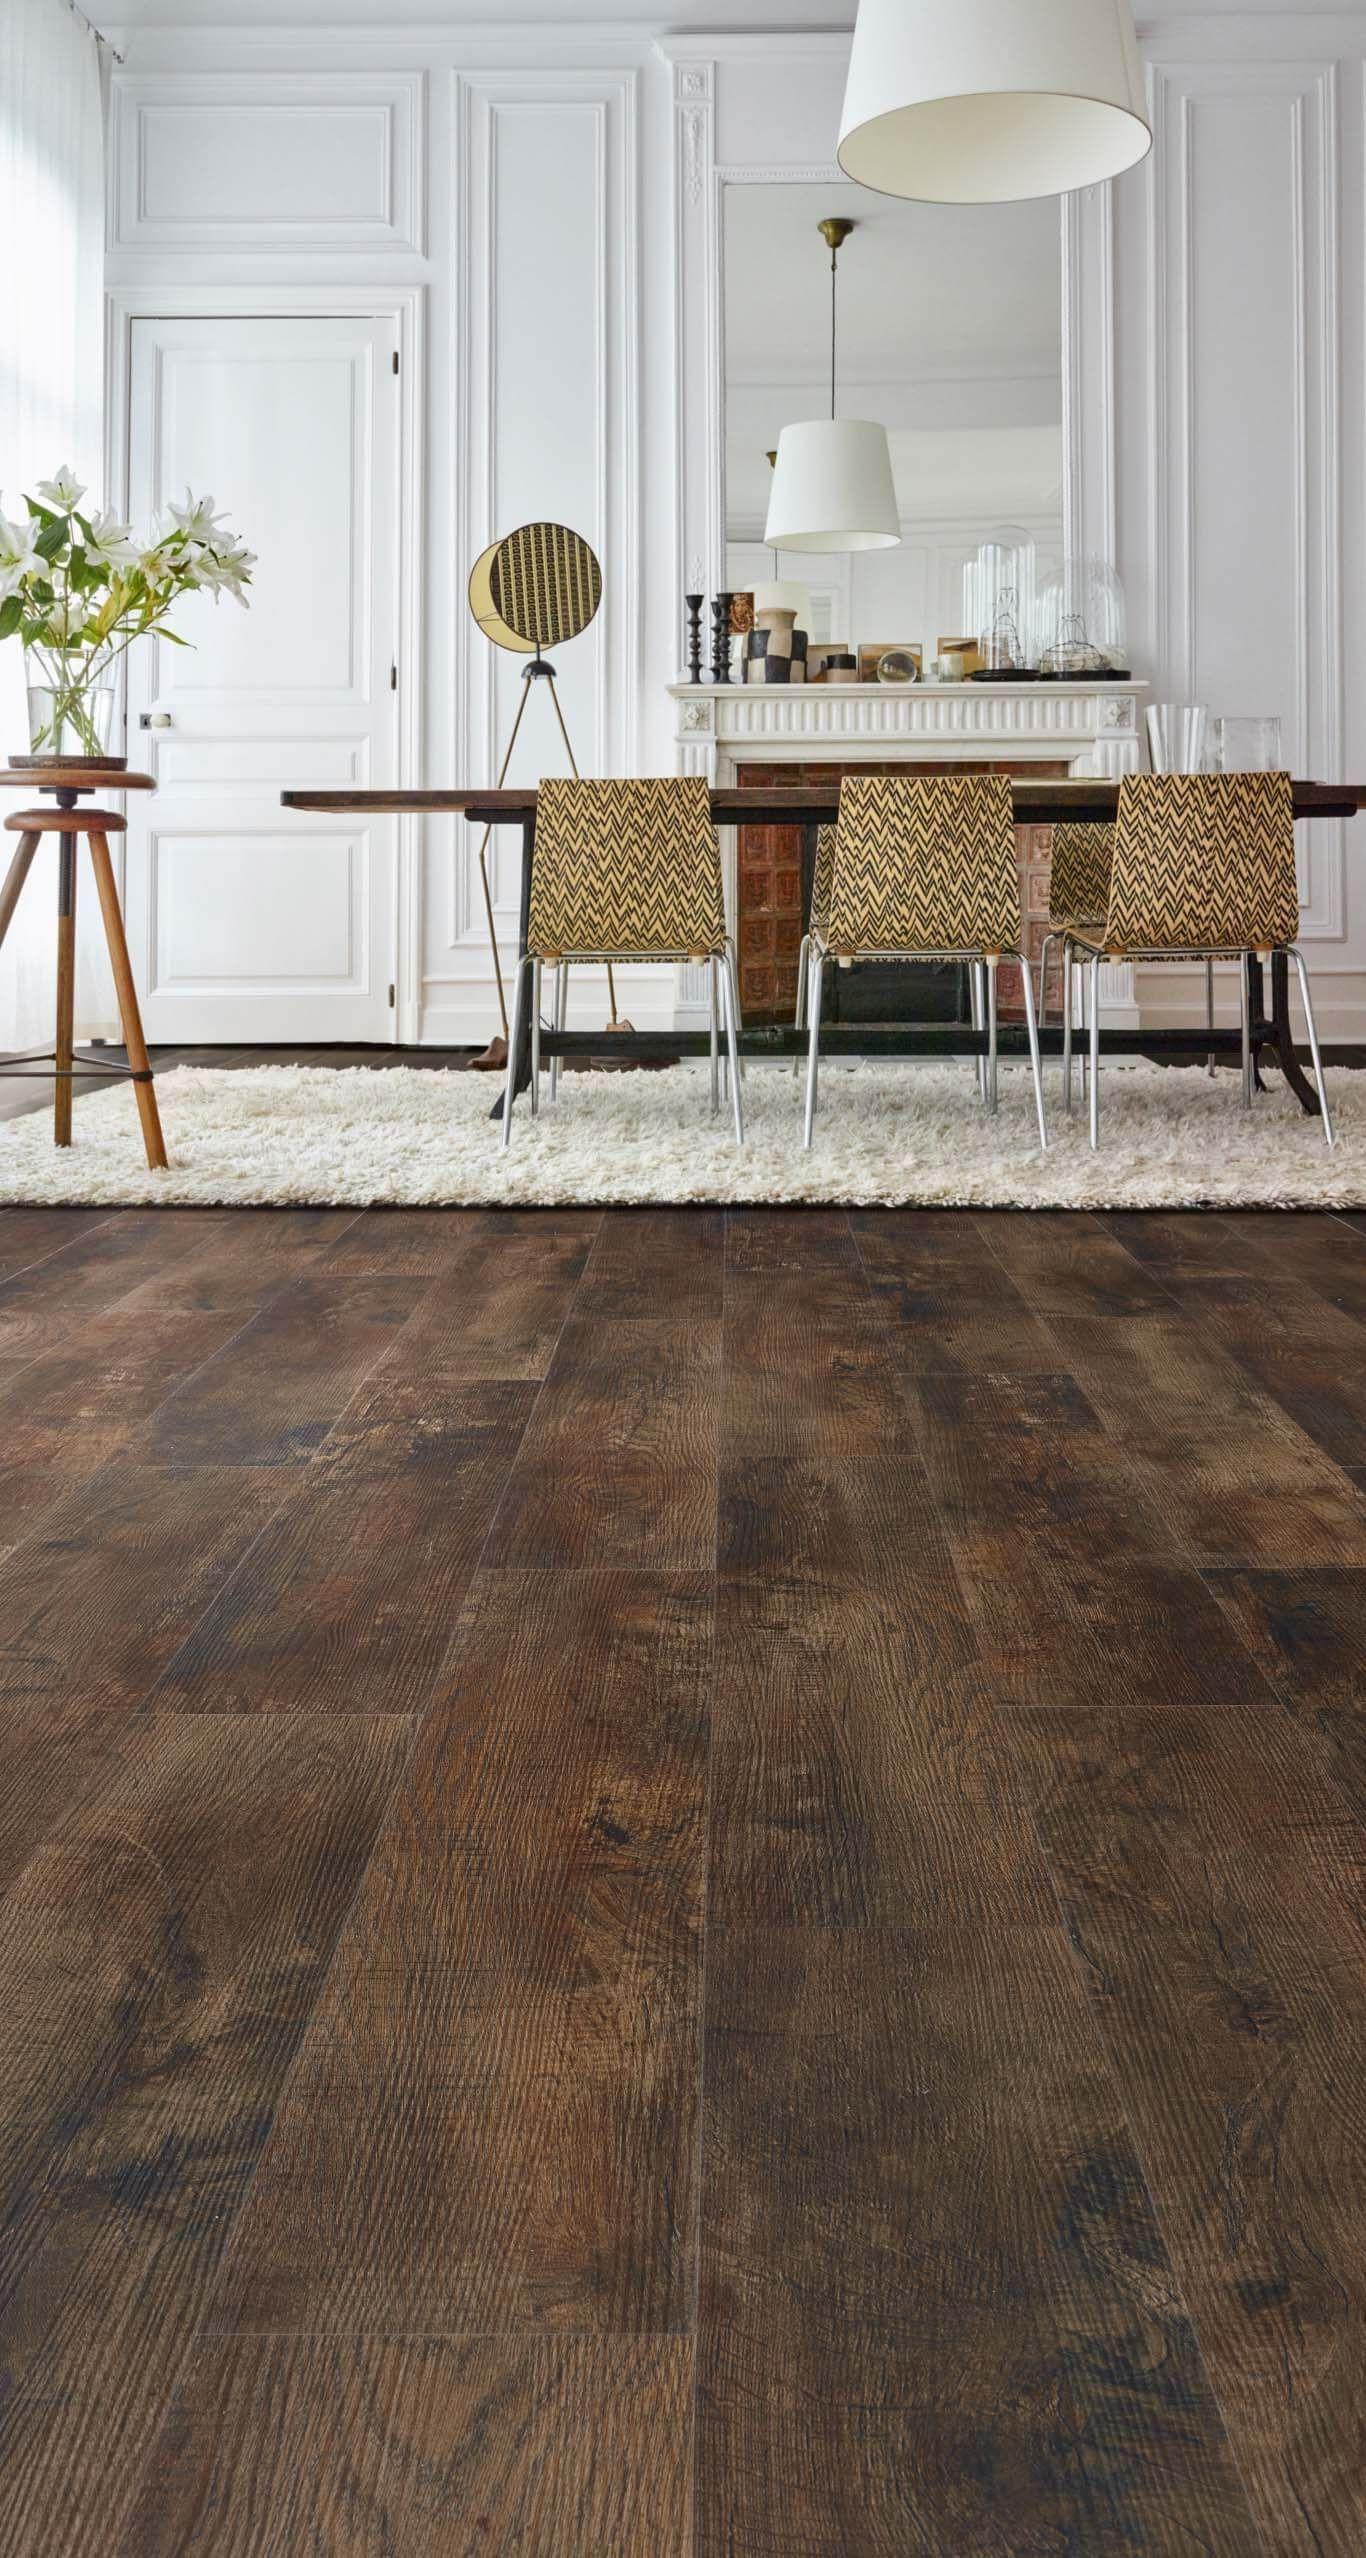 Cost to Install Vinyl Flooring and Vinyl Cost per Square-feet – hangiulkeninmali.com/home